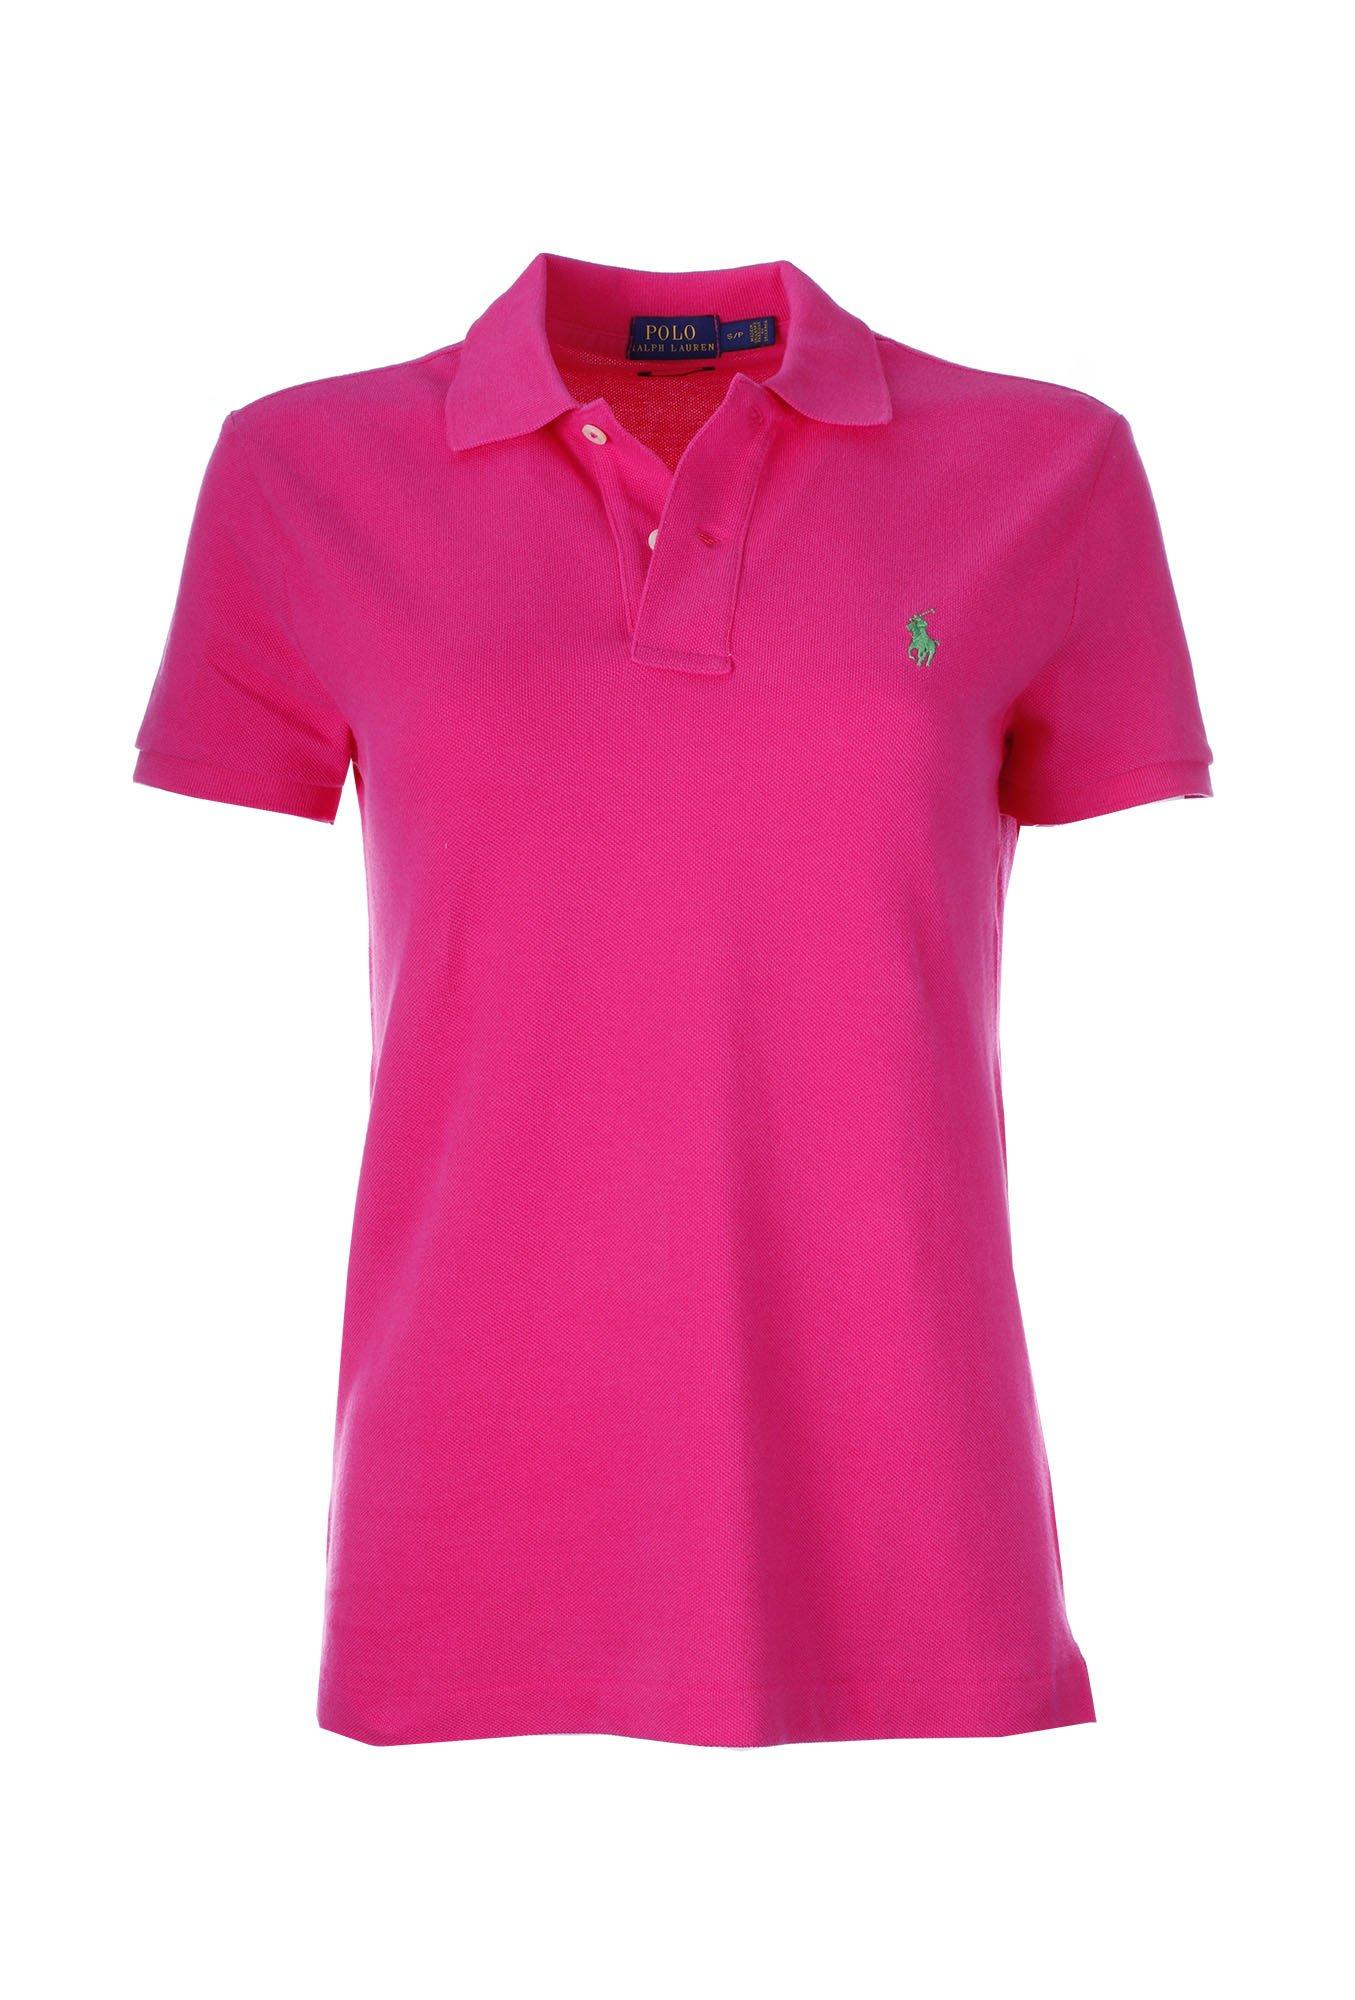 Polo Ralph Lauren Women's Classic Fit Mesh Polo Shirt (X-Large, Shocking Pink) by RALPH LAUREN (Image #1)